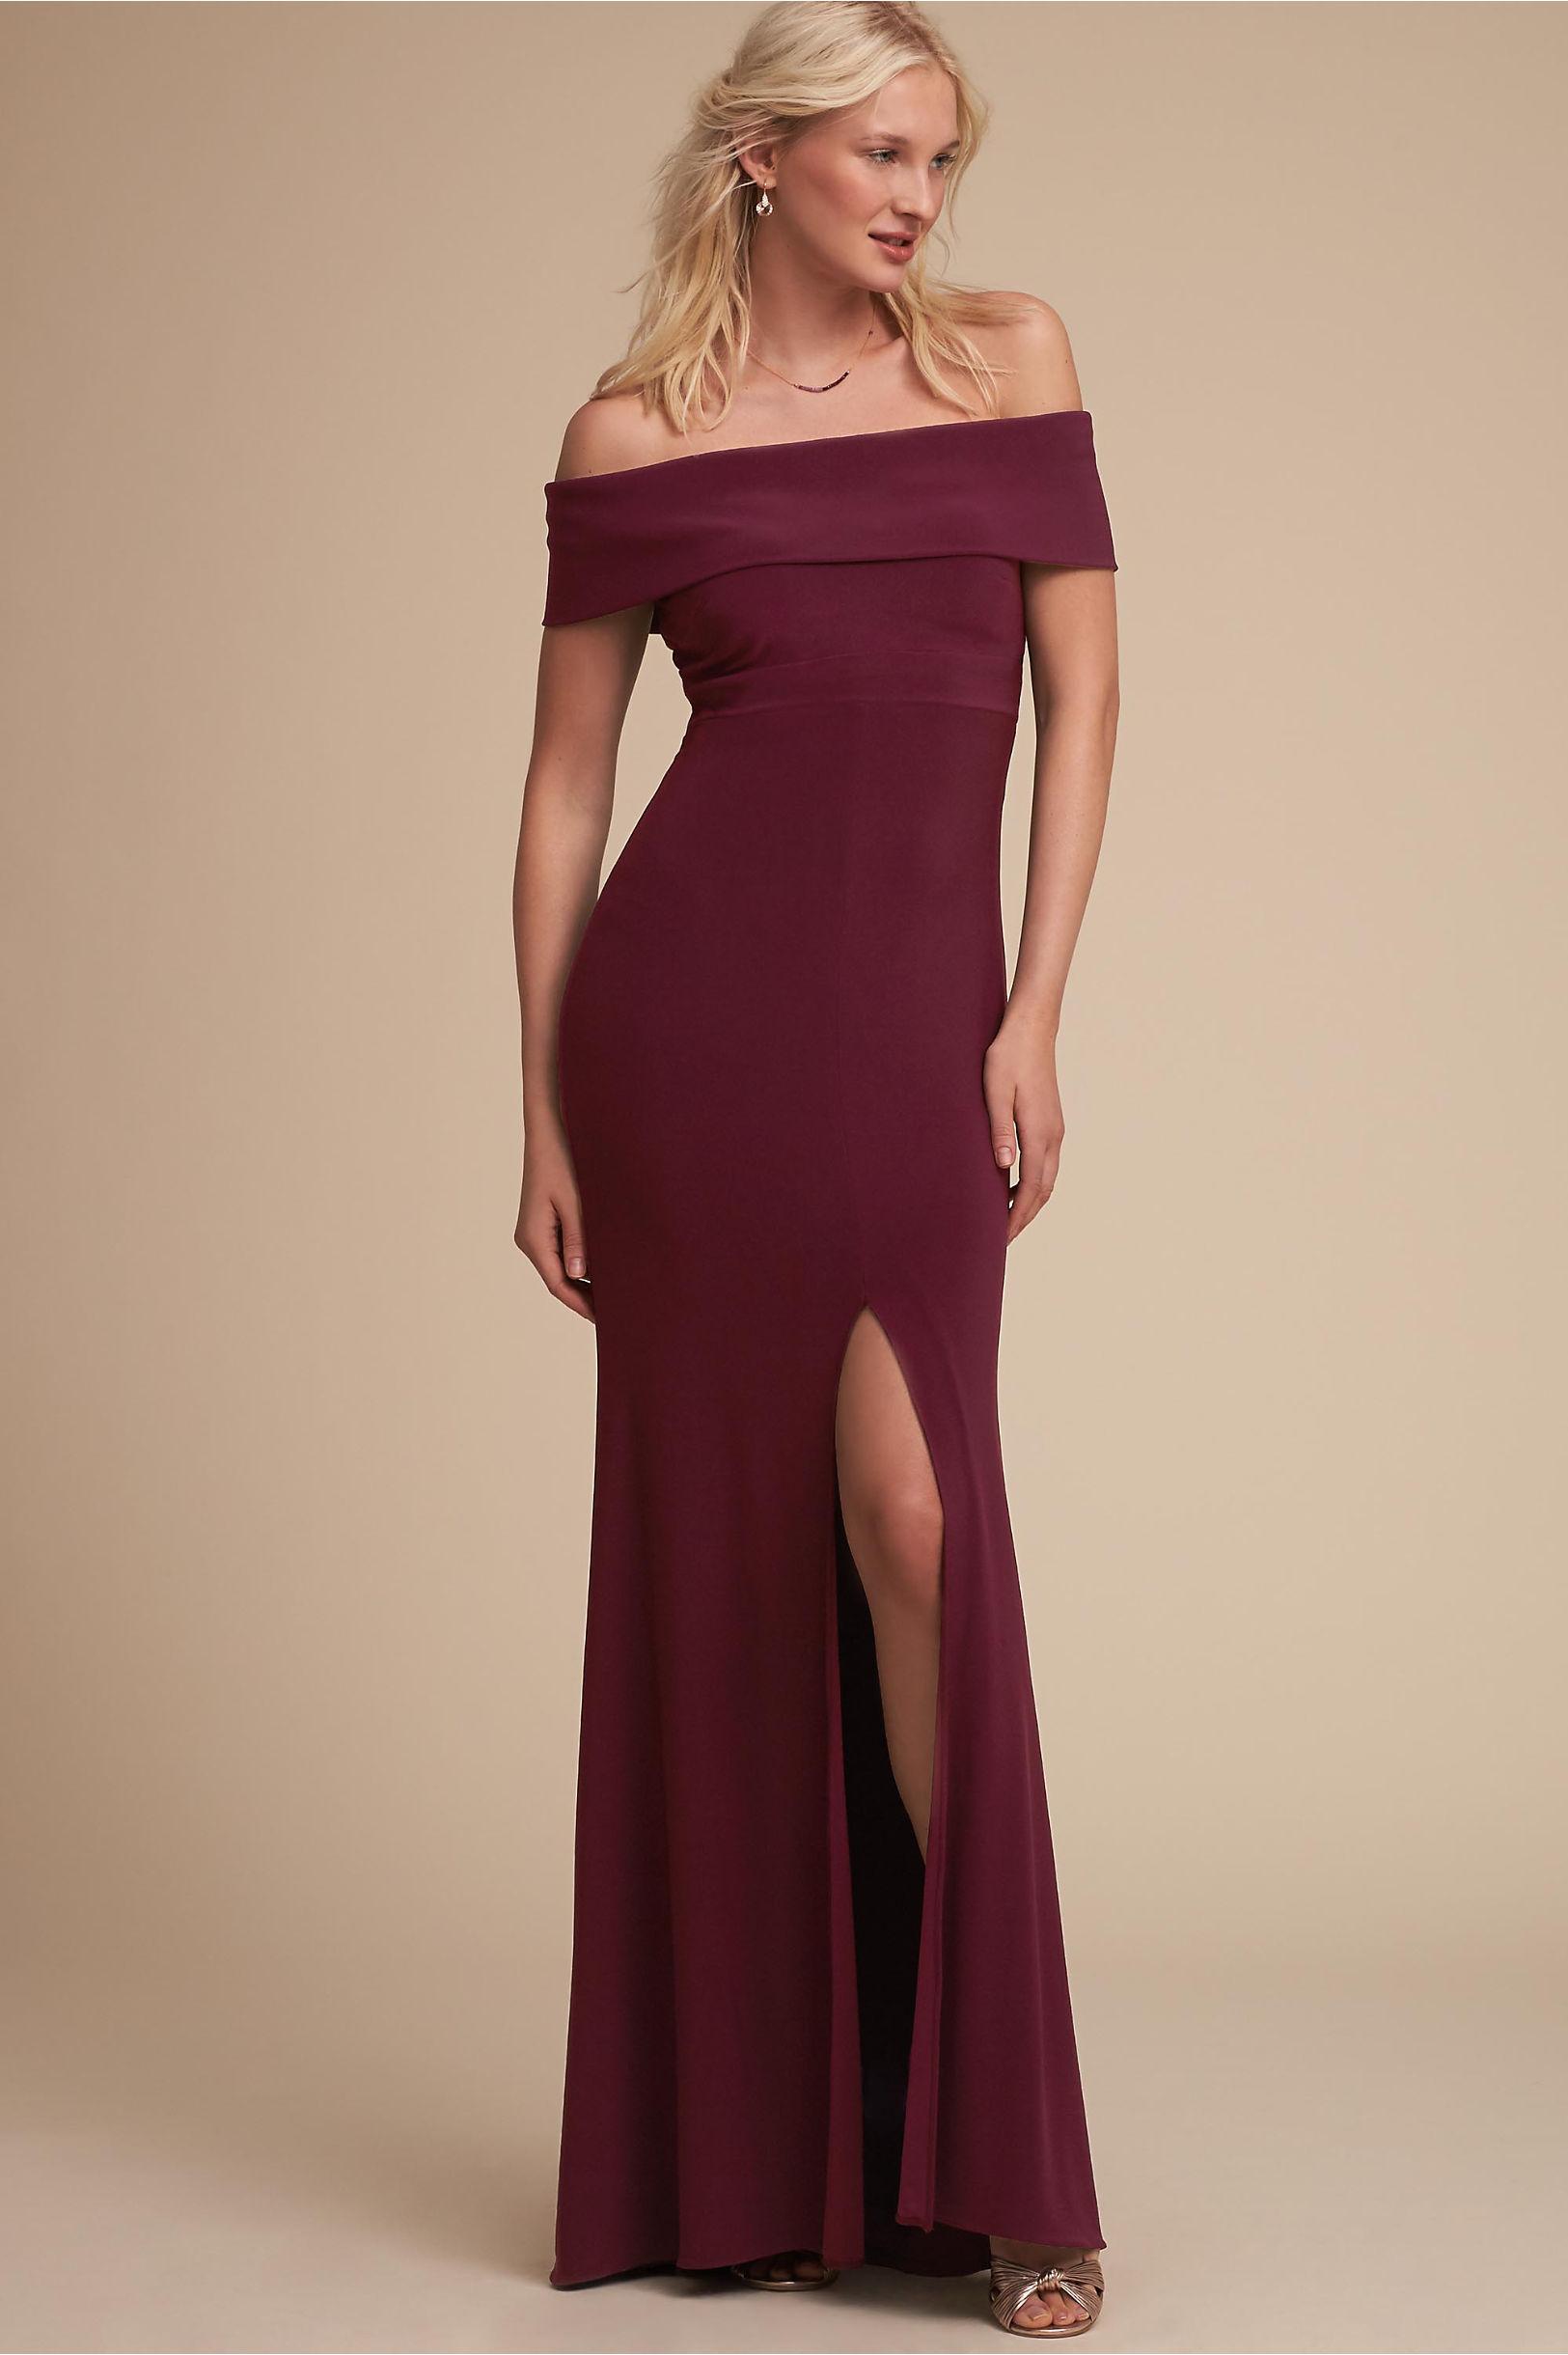 Ember Dress in Sale | BHLDN